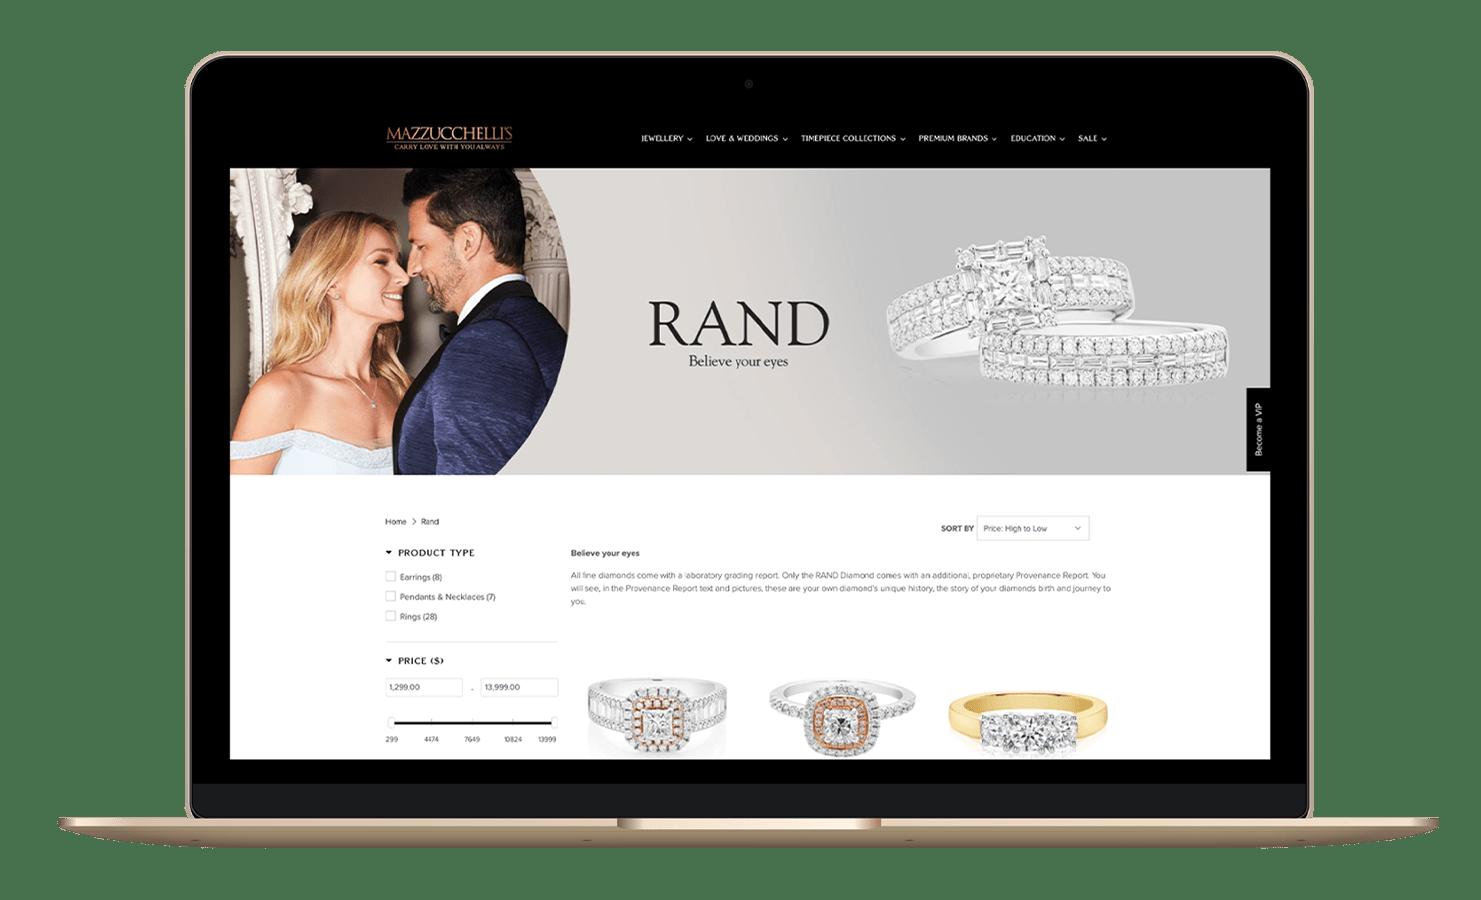 Mazzucchelli's Website –Rand Diamonds on Mazzucchelli's Jewellery Website